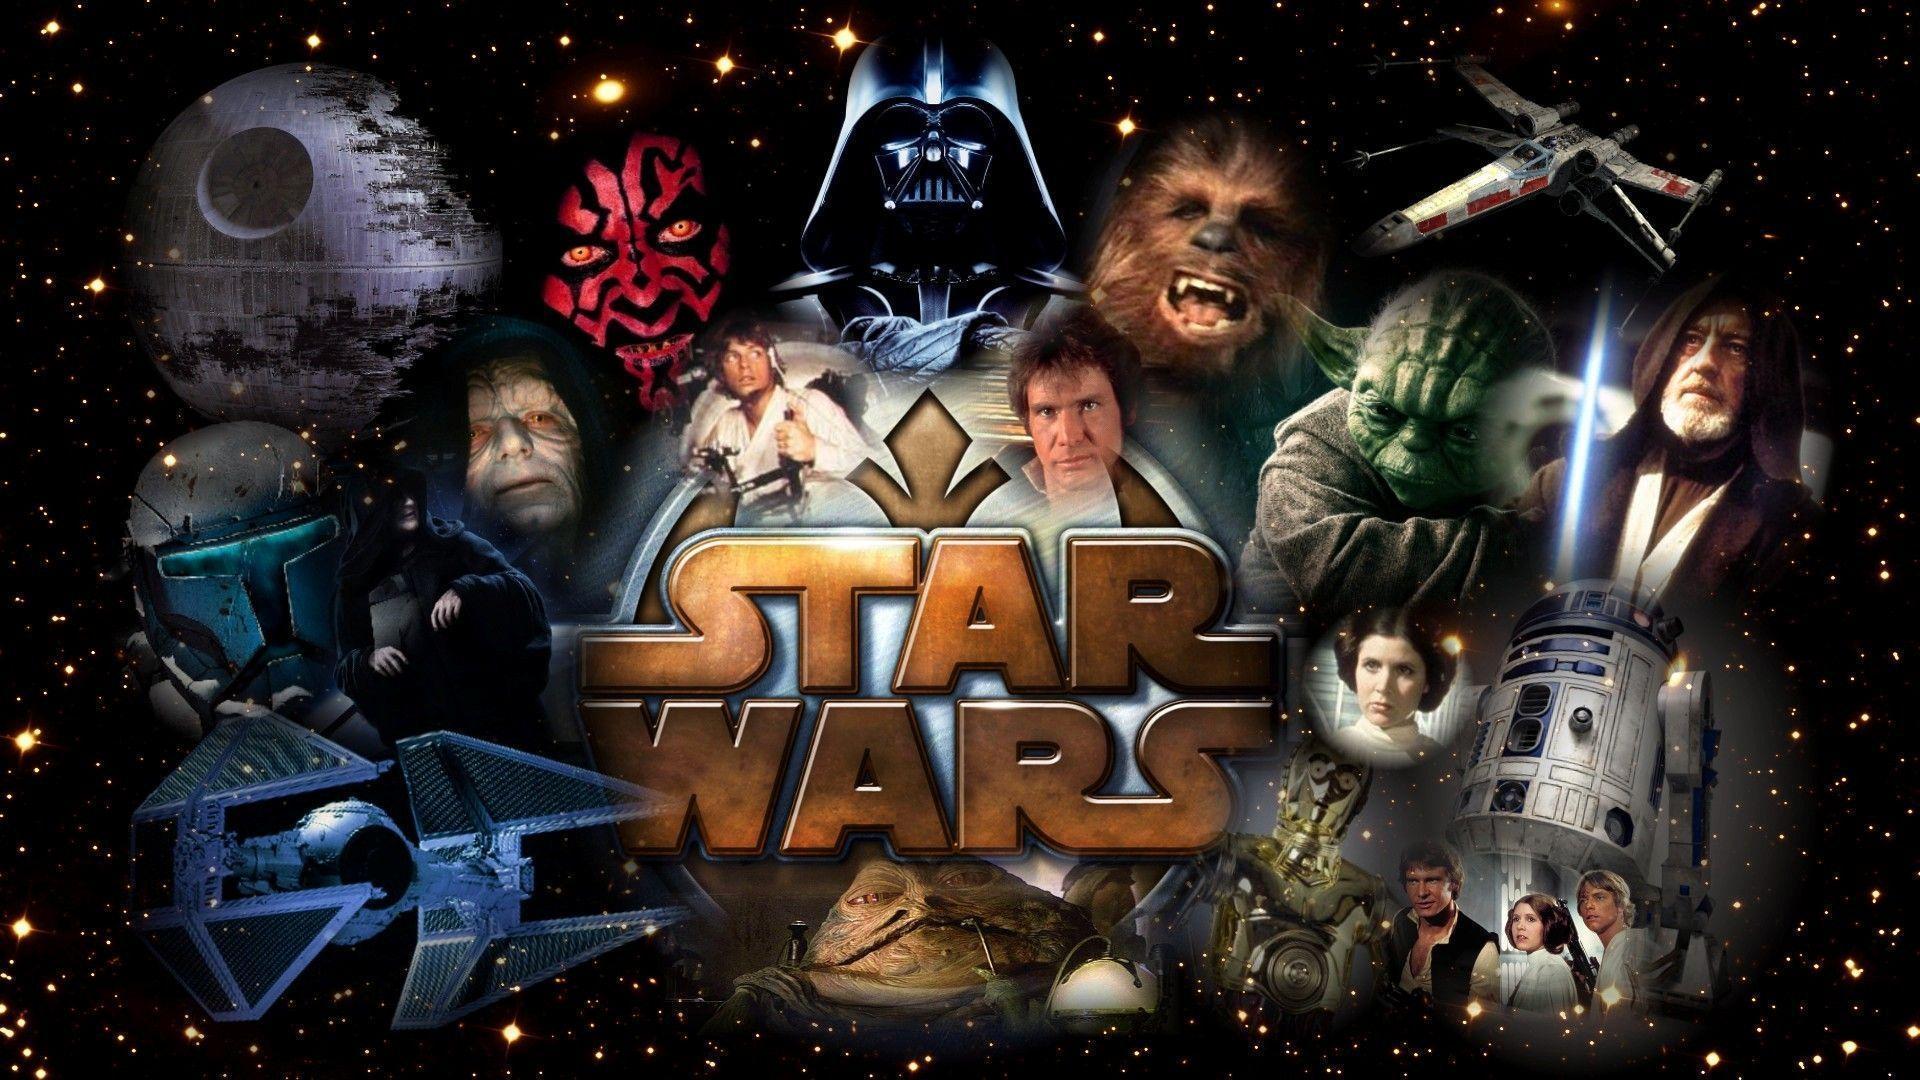 Star Wars Character Wallpapers Wallpaper Cave